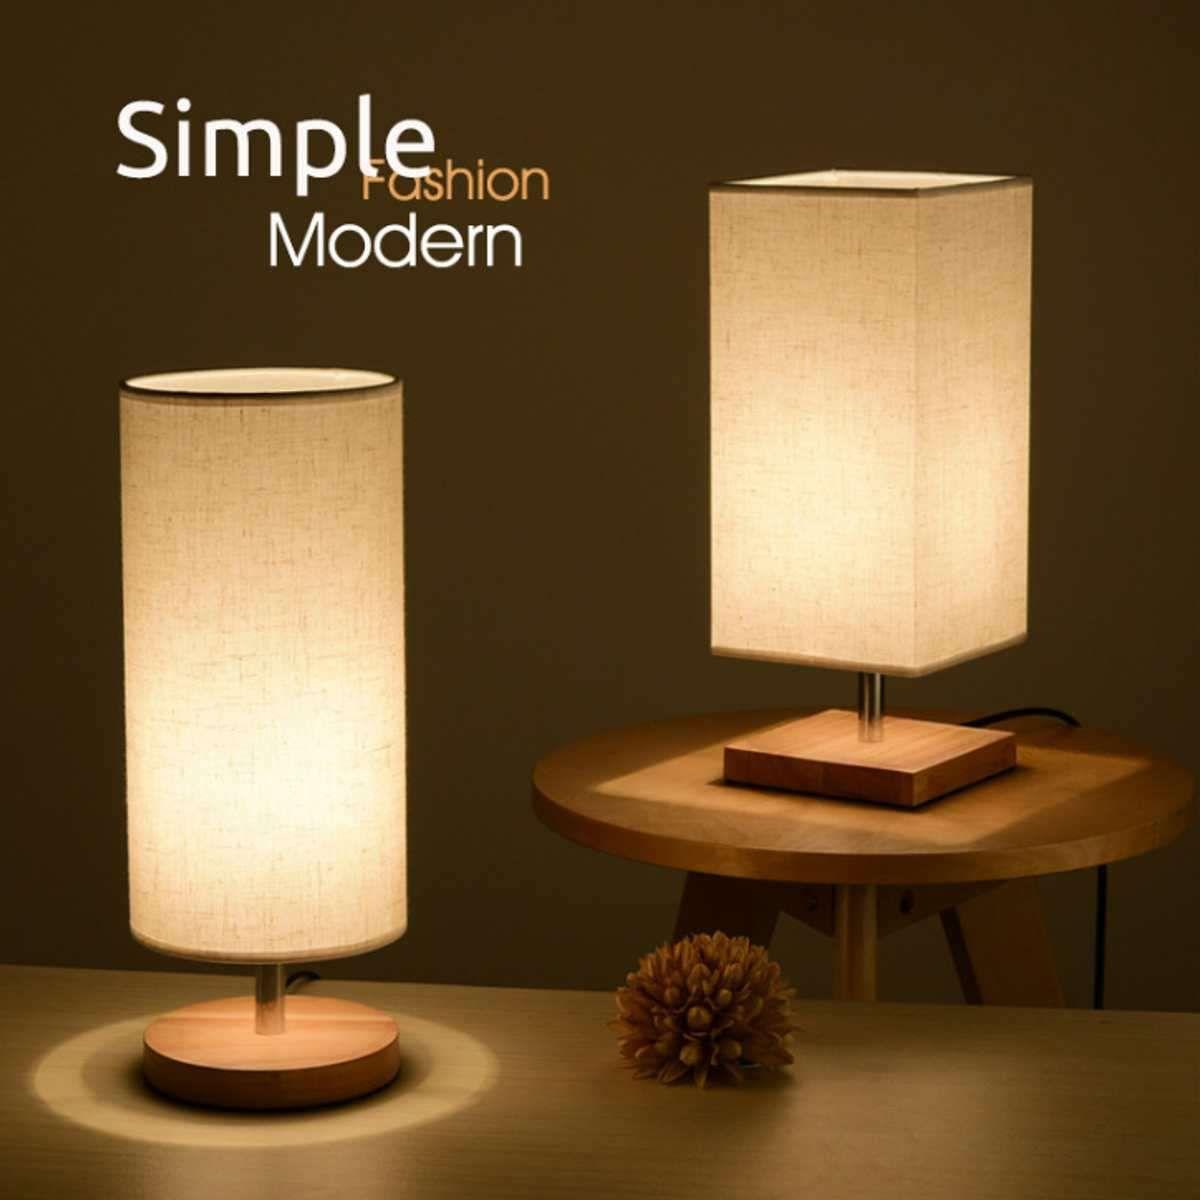 Simple Elegant Wall Lamp Wood Table Lamps For Bedroom Bedroom